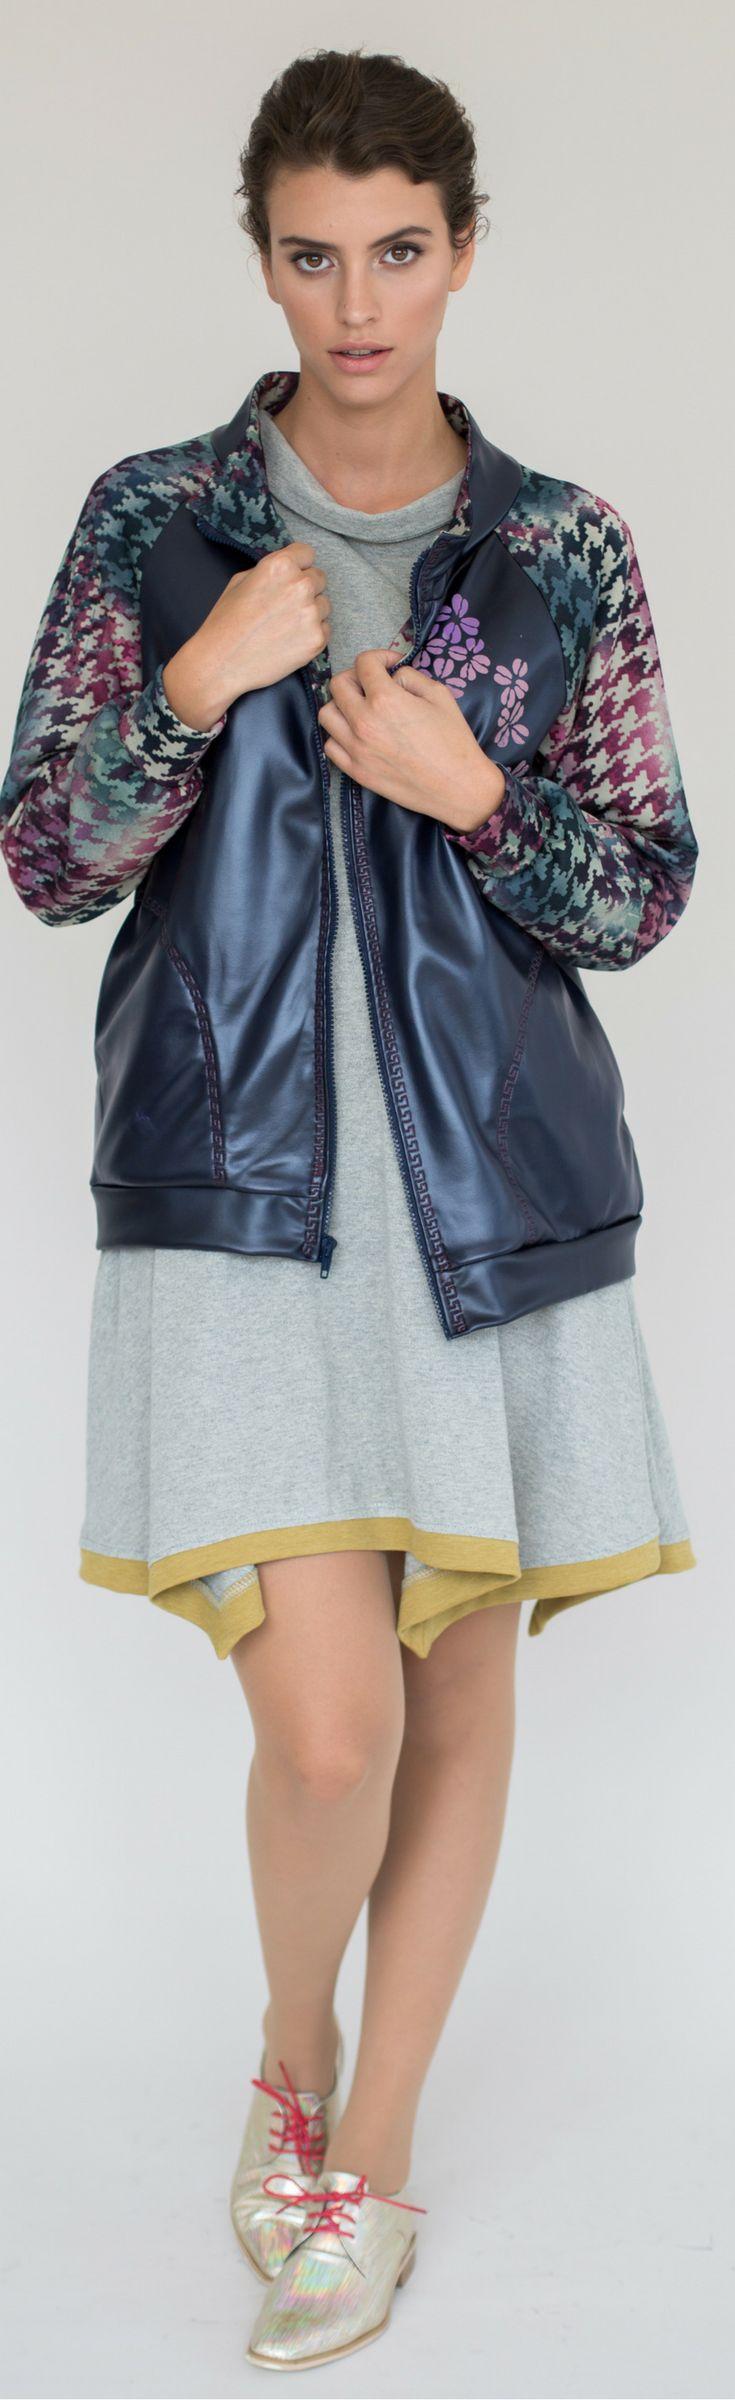 Bomber jacket women, Womens jacket, Navy blue jacket, Lightweight jacket, Blue bomber jacket, Plussize jacket, Short jacket